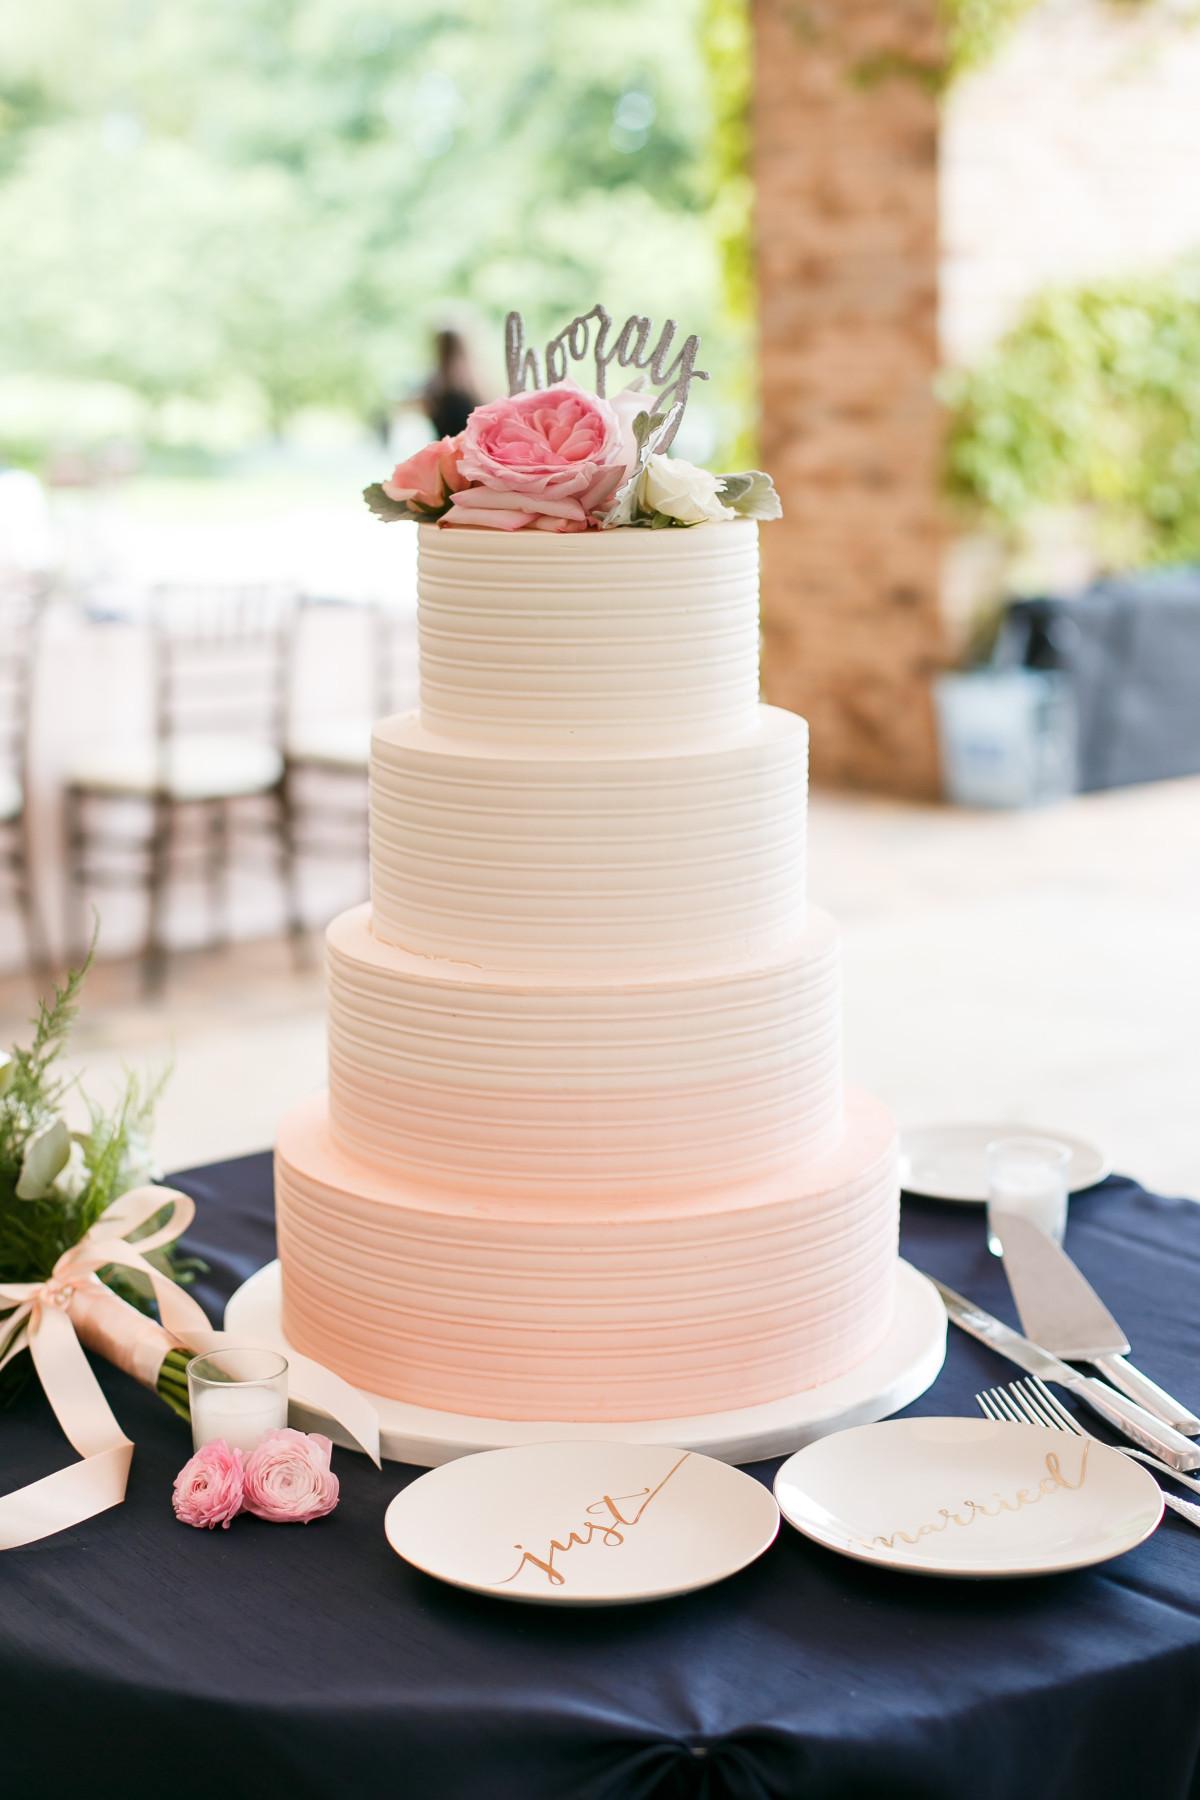 Buttercream Wedding Cakes  Pink Ombre Buttercream Wedding Cake